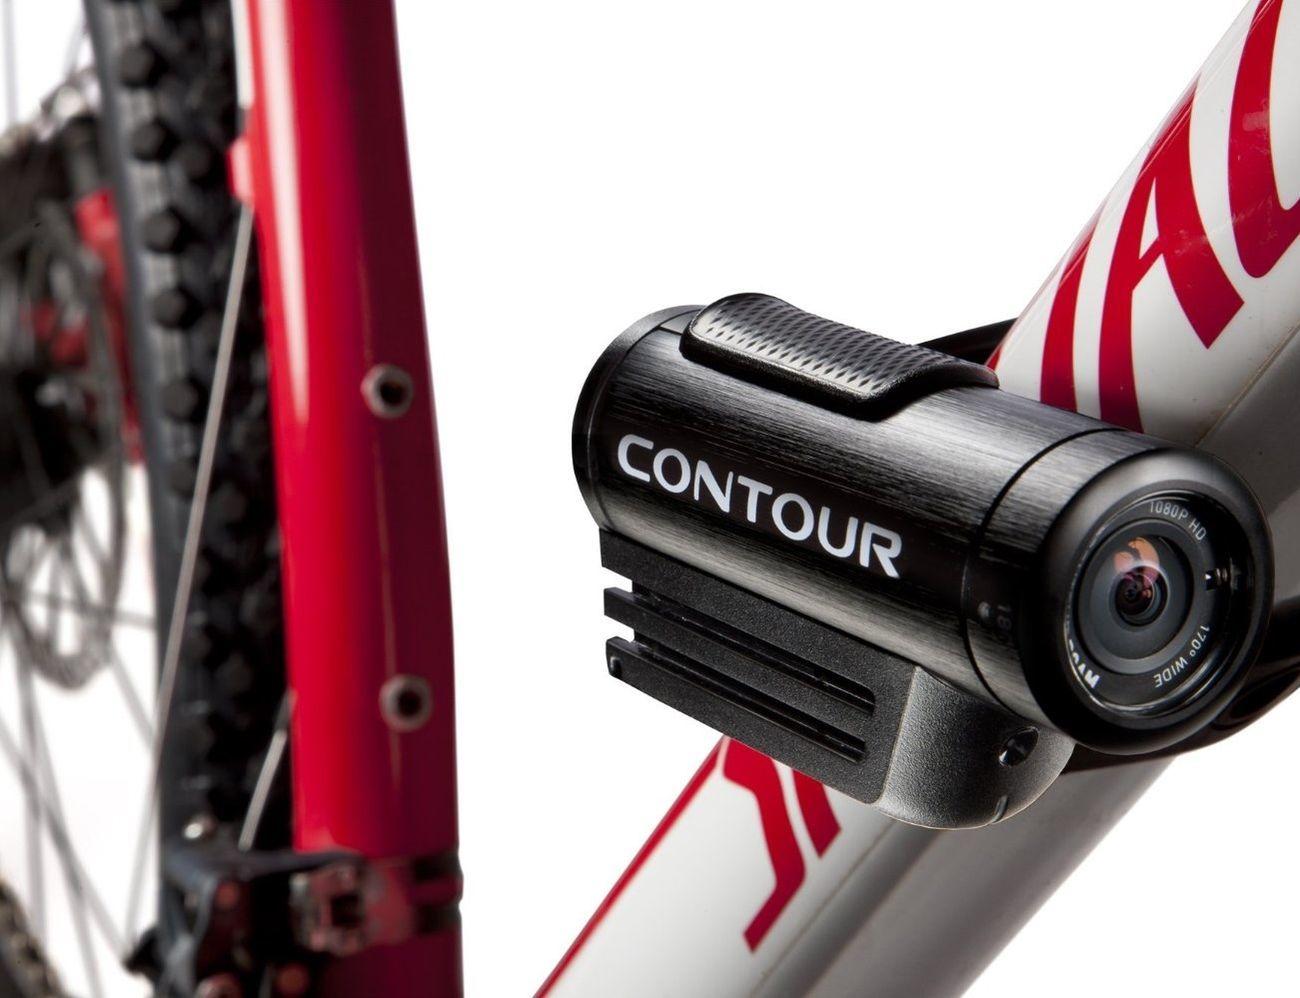 Contour ROAM2 Waterproof Video Camera